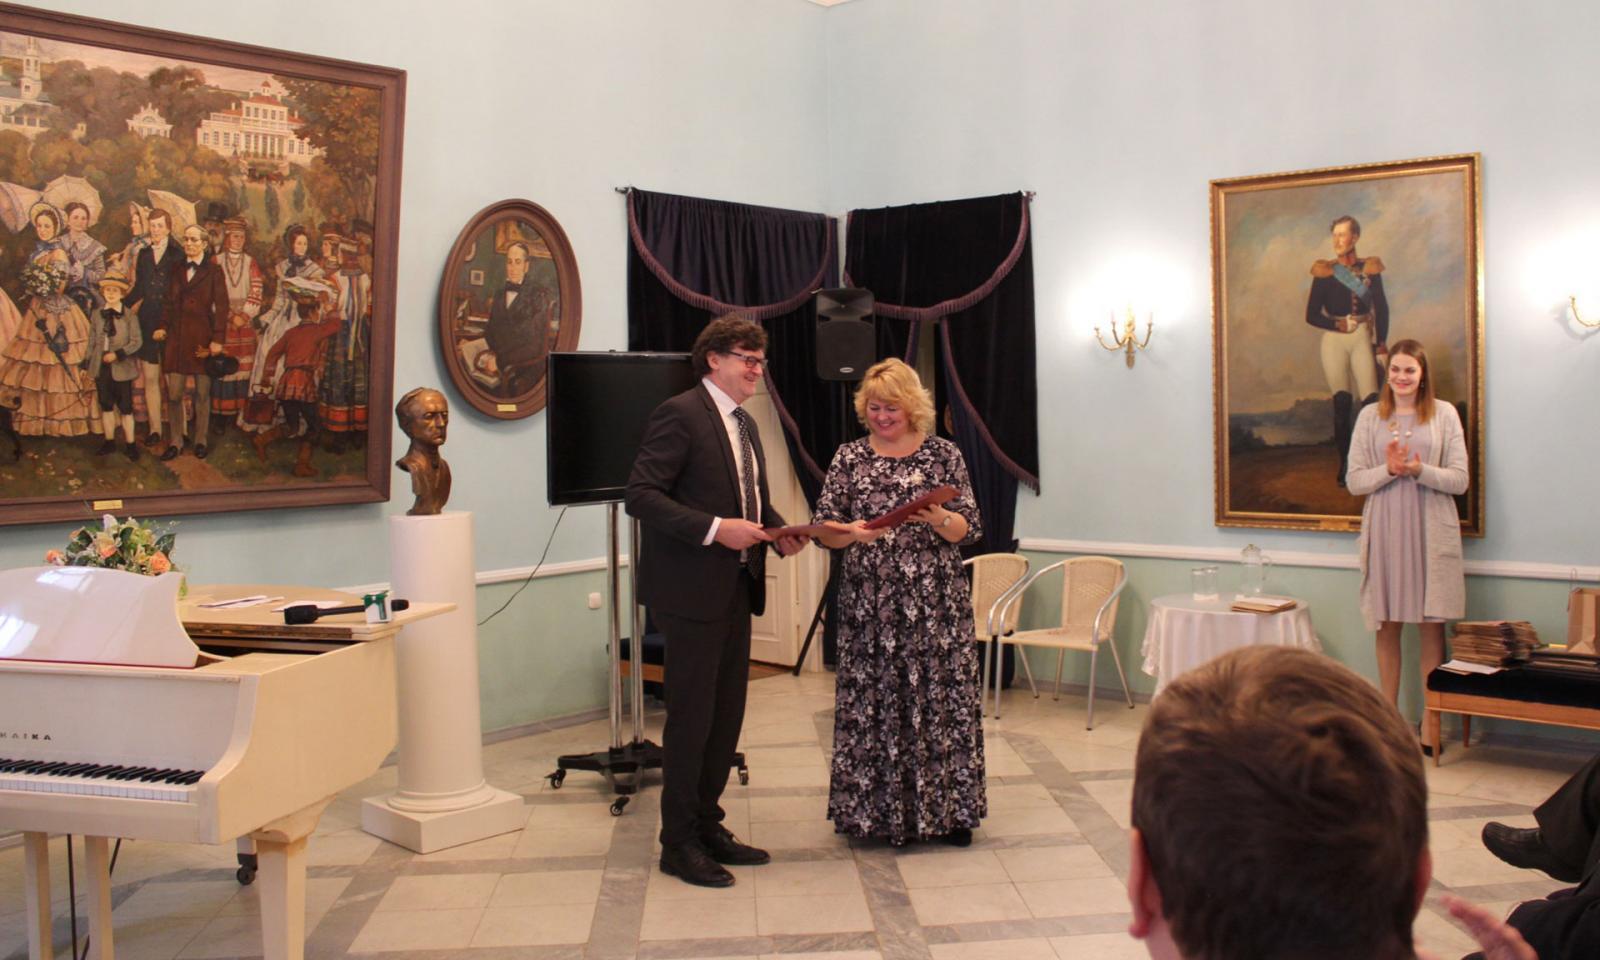 Представители МИД приняли участие в праздновании 215-летия со дня рождения Ф. И. Тютчева